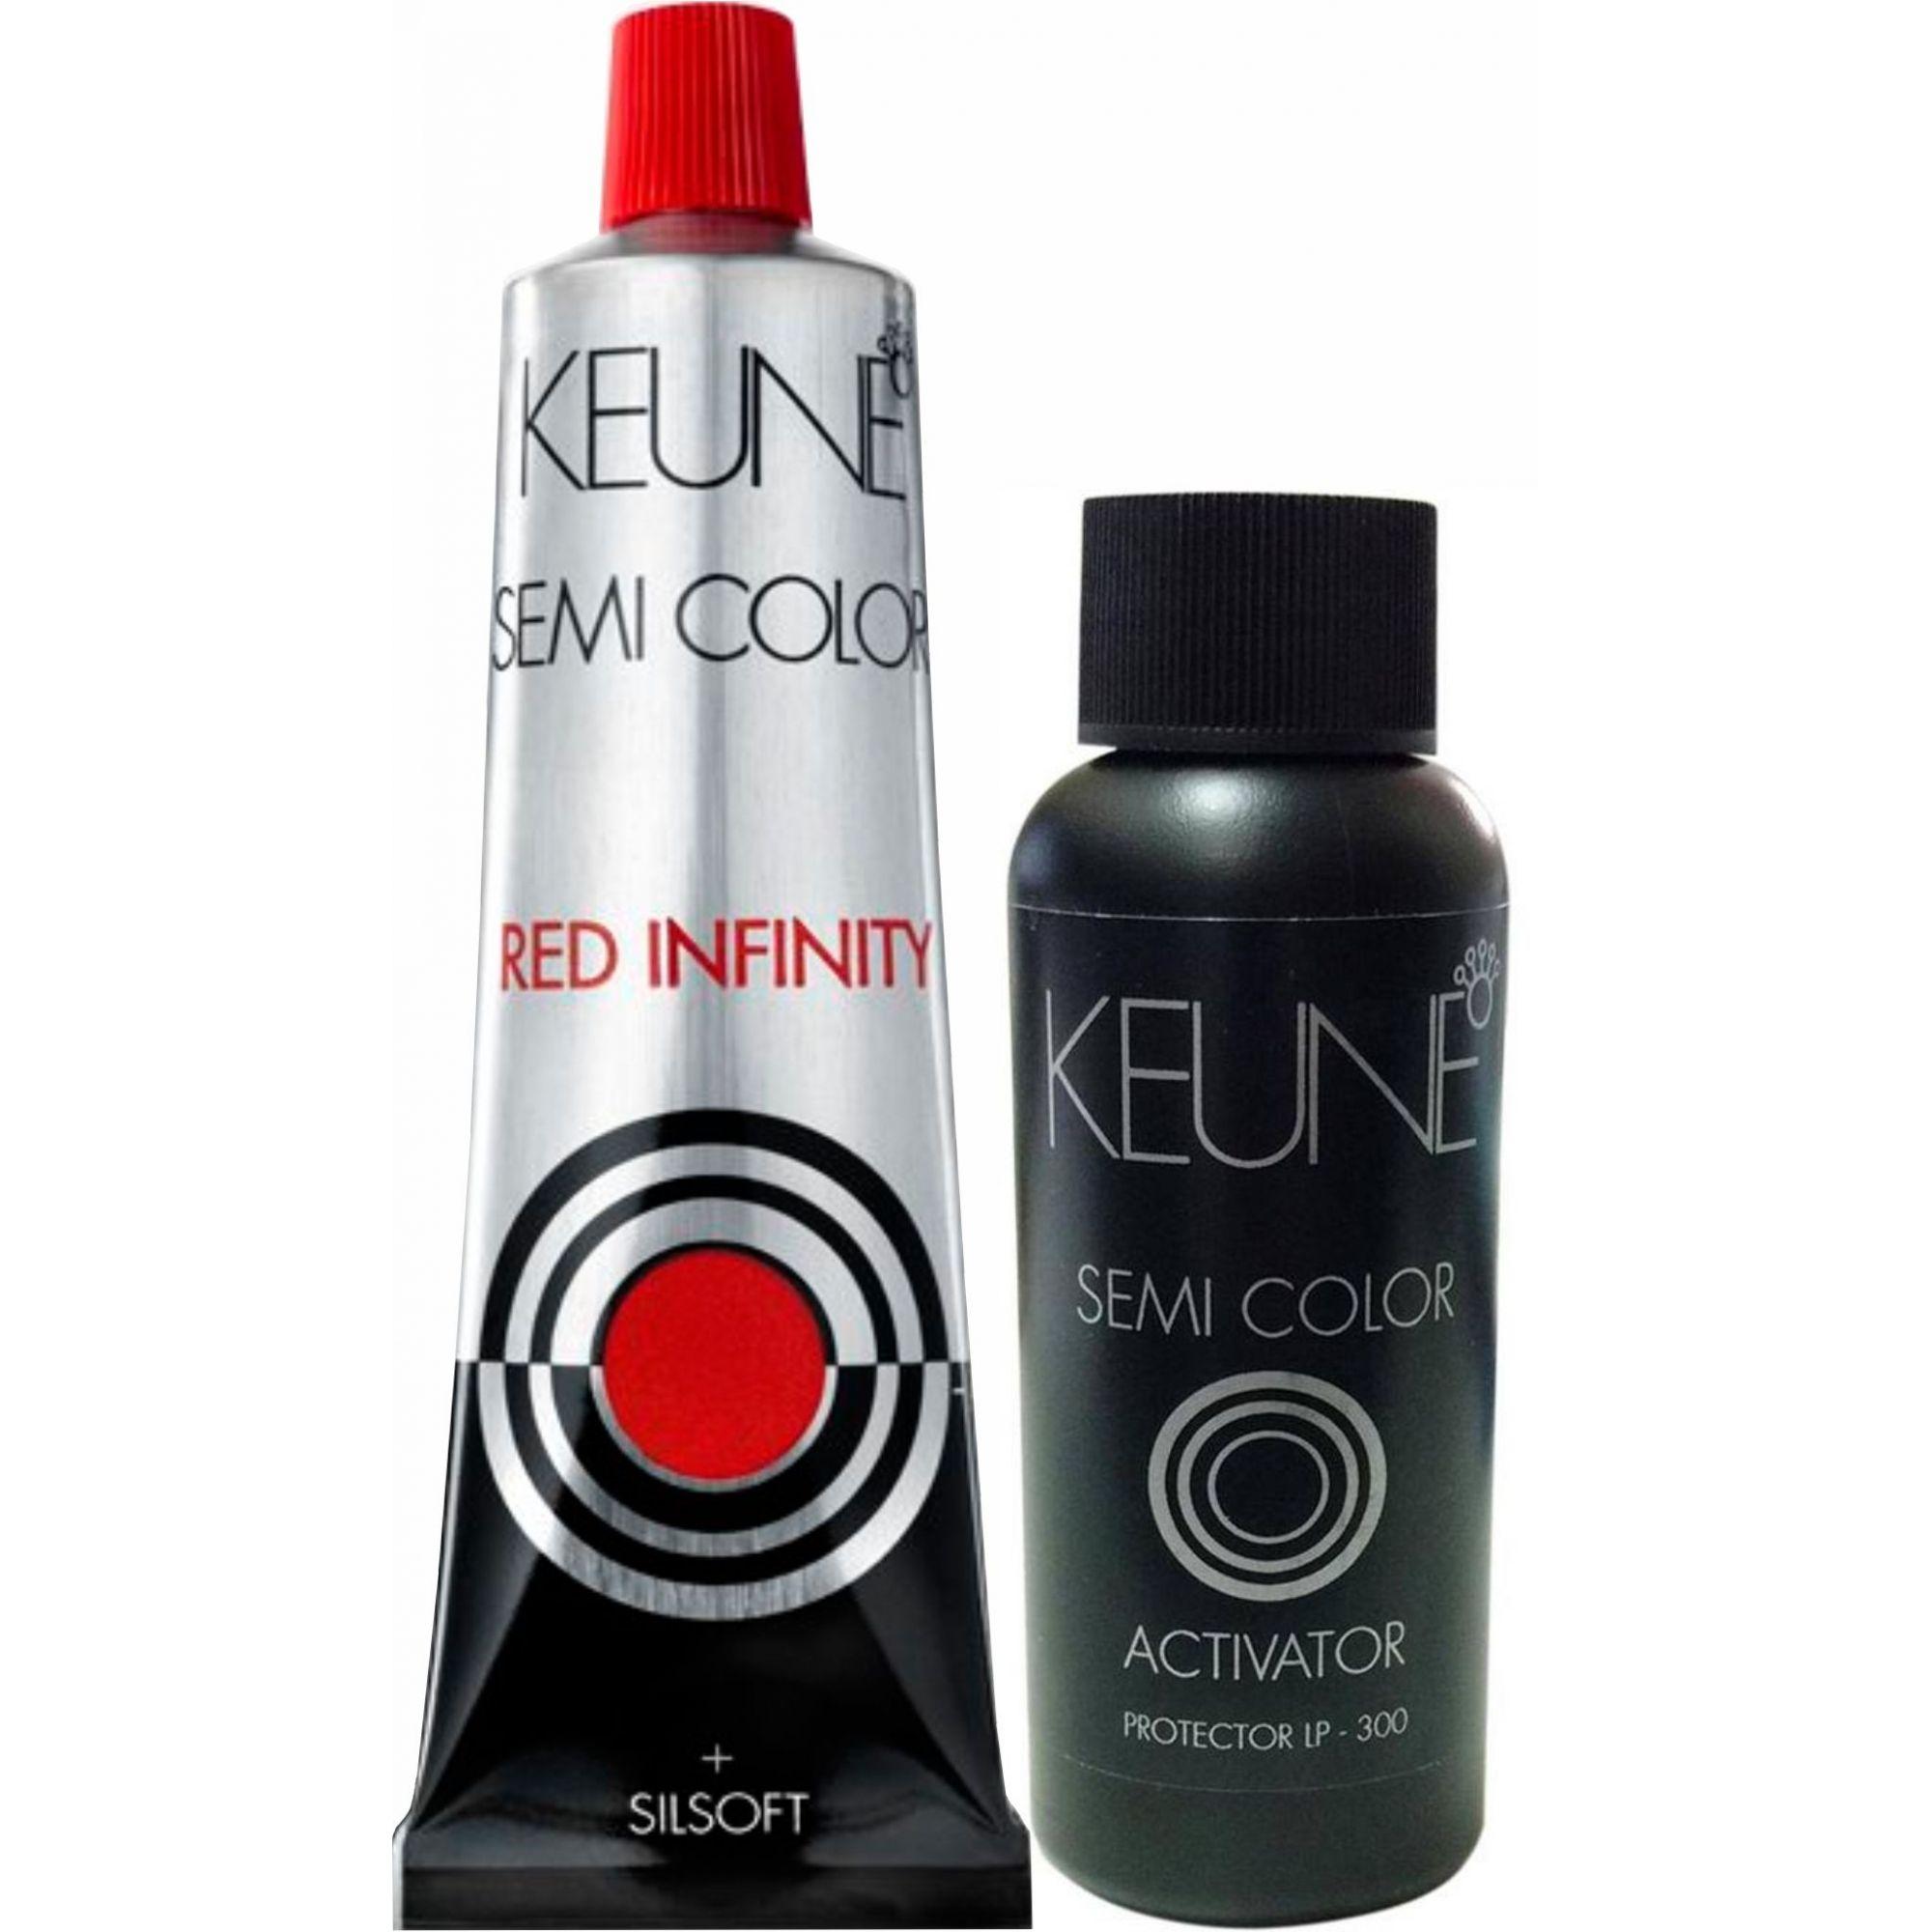 Kit Keune Semi Color RI 60ml - Cor 5.56 - Castanho Claro Mogno + Ativador de 60ml